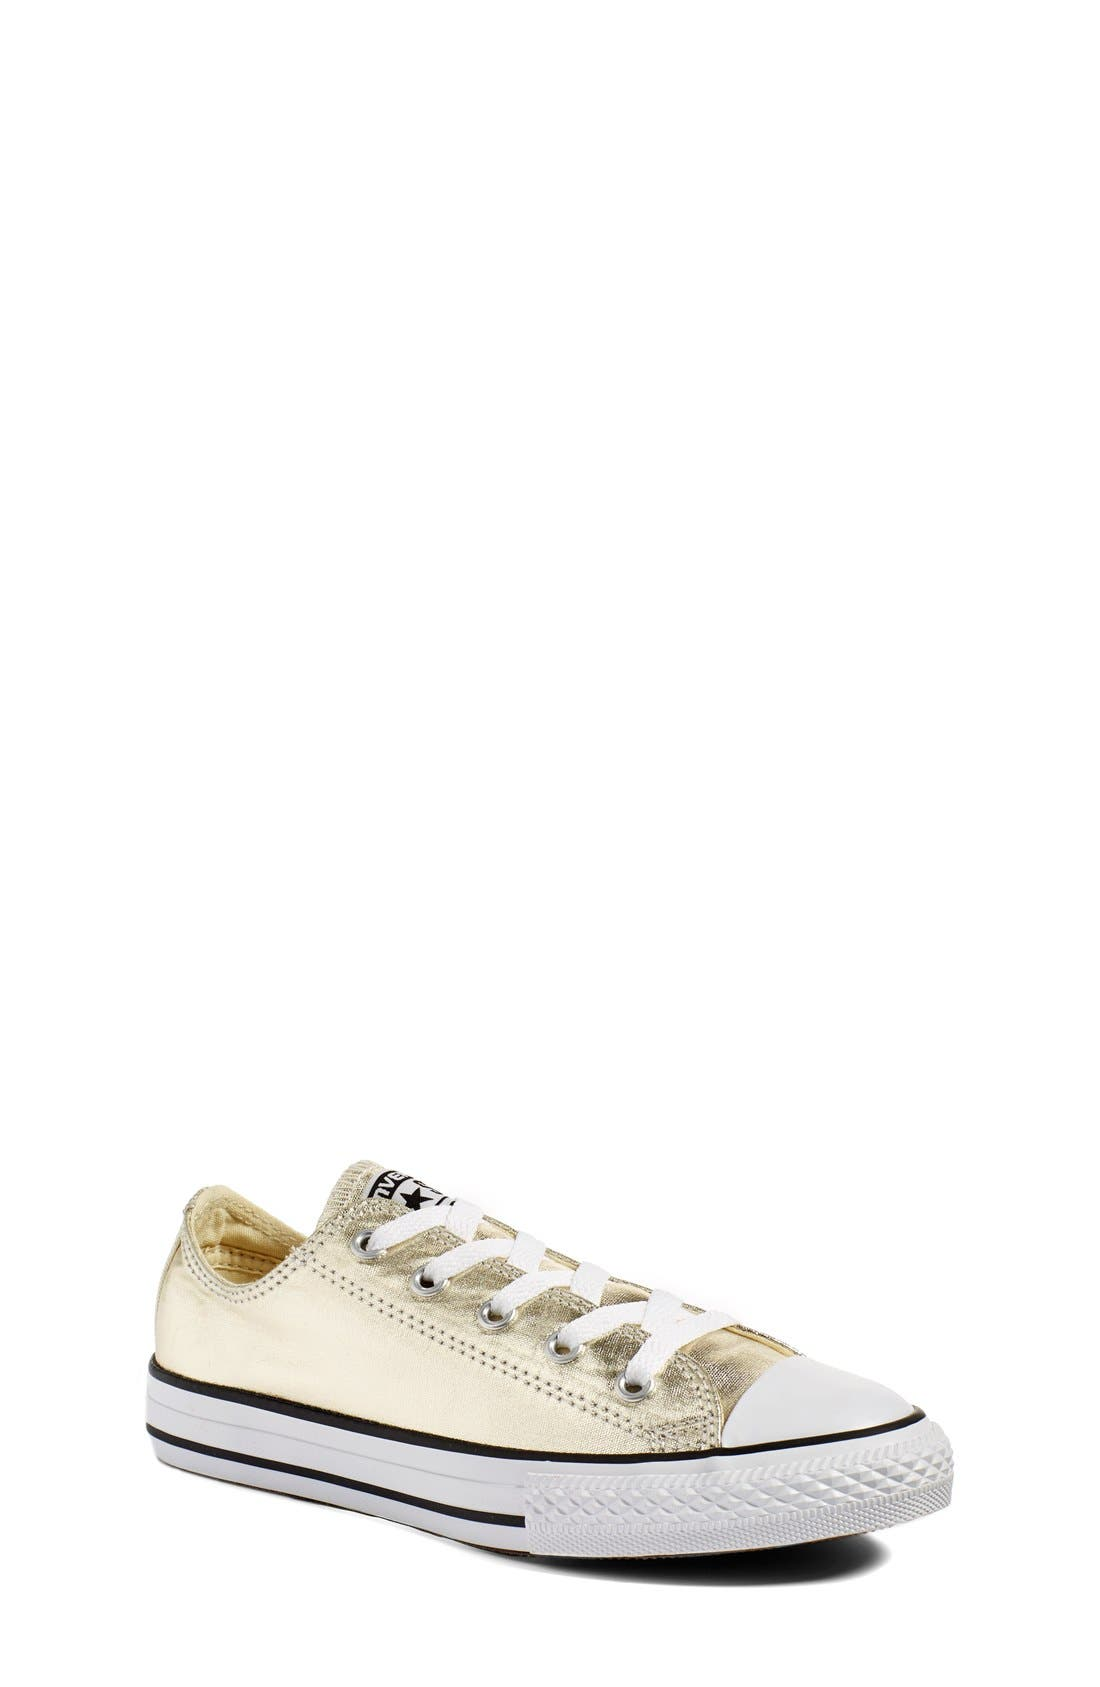 CONVERSE Chuck Taylor® All Star® Metallic Sneaker